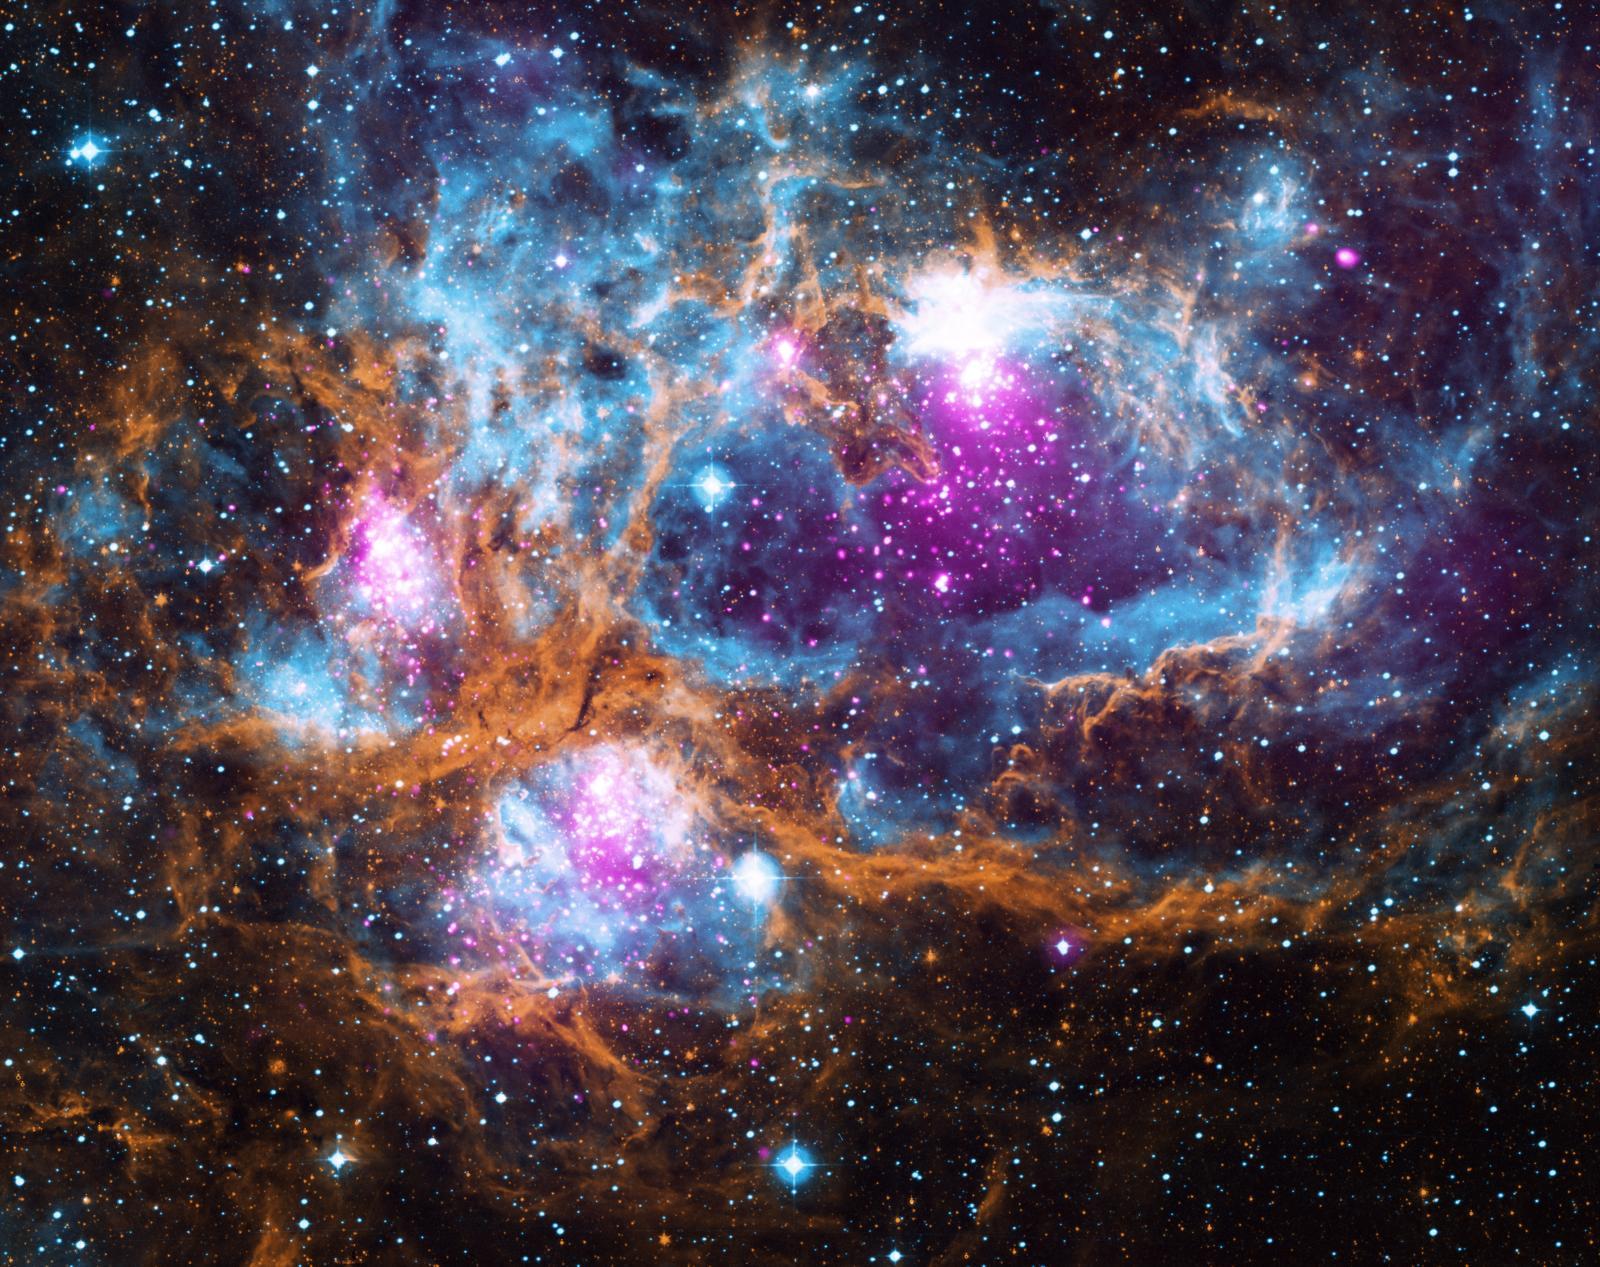 Cosmic_-Winter-u2019_Wonderland-1